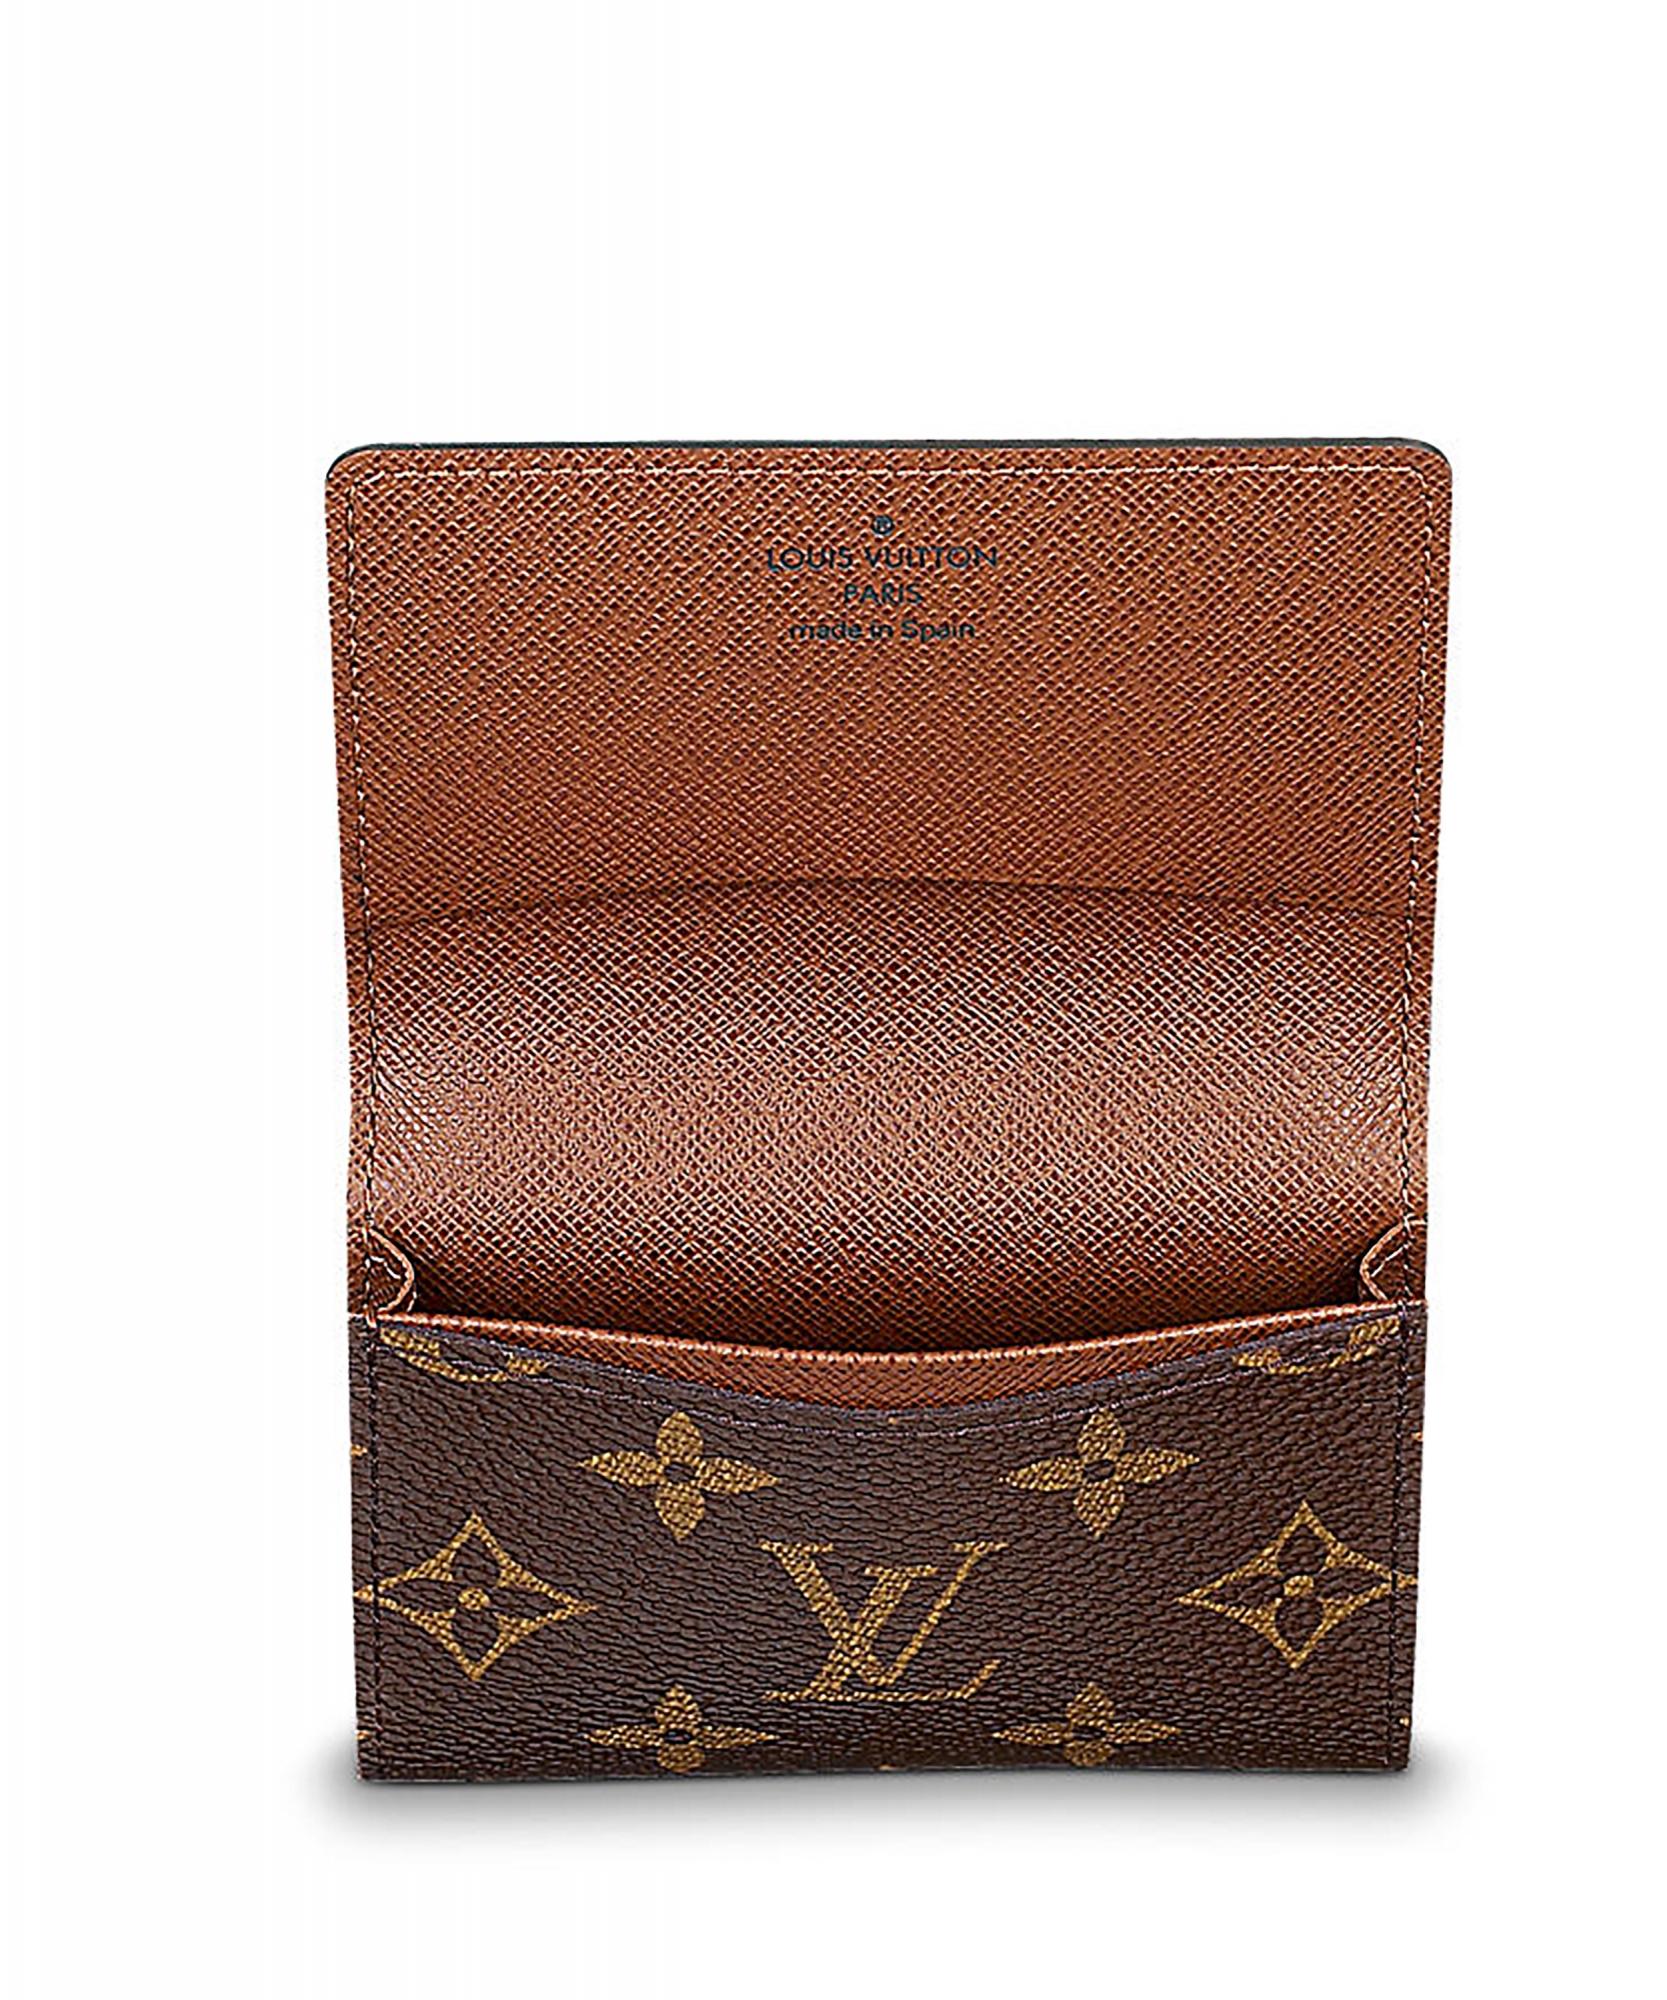 Louis Vuitton Business Card Holder Artlistings